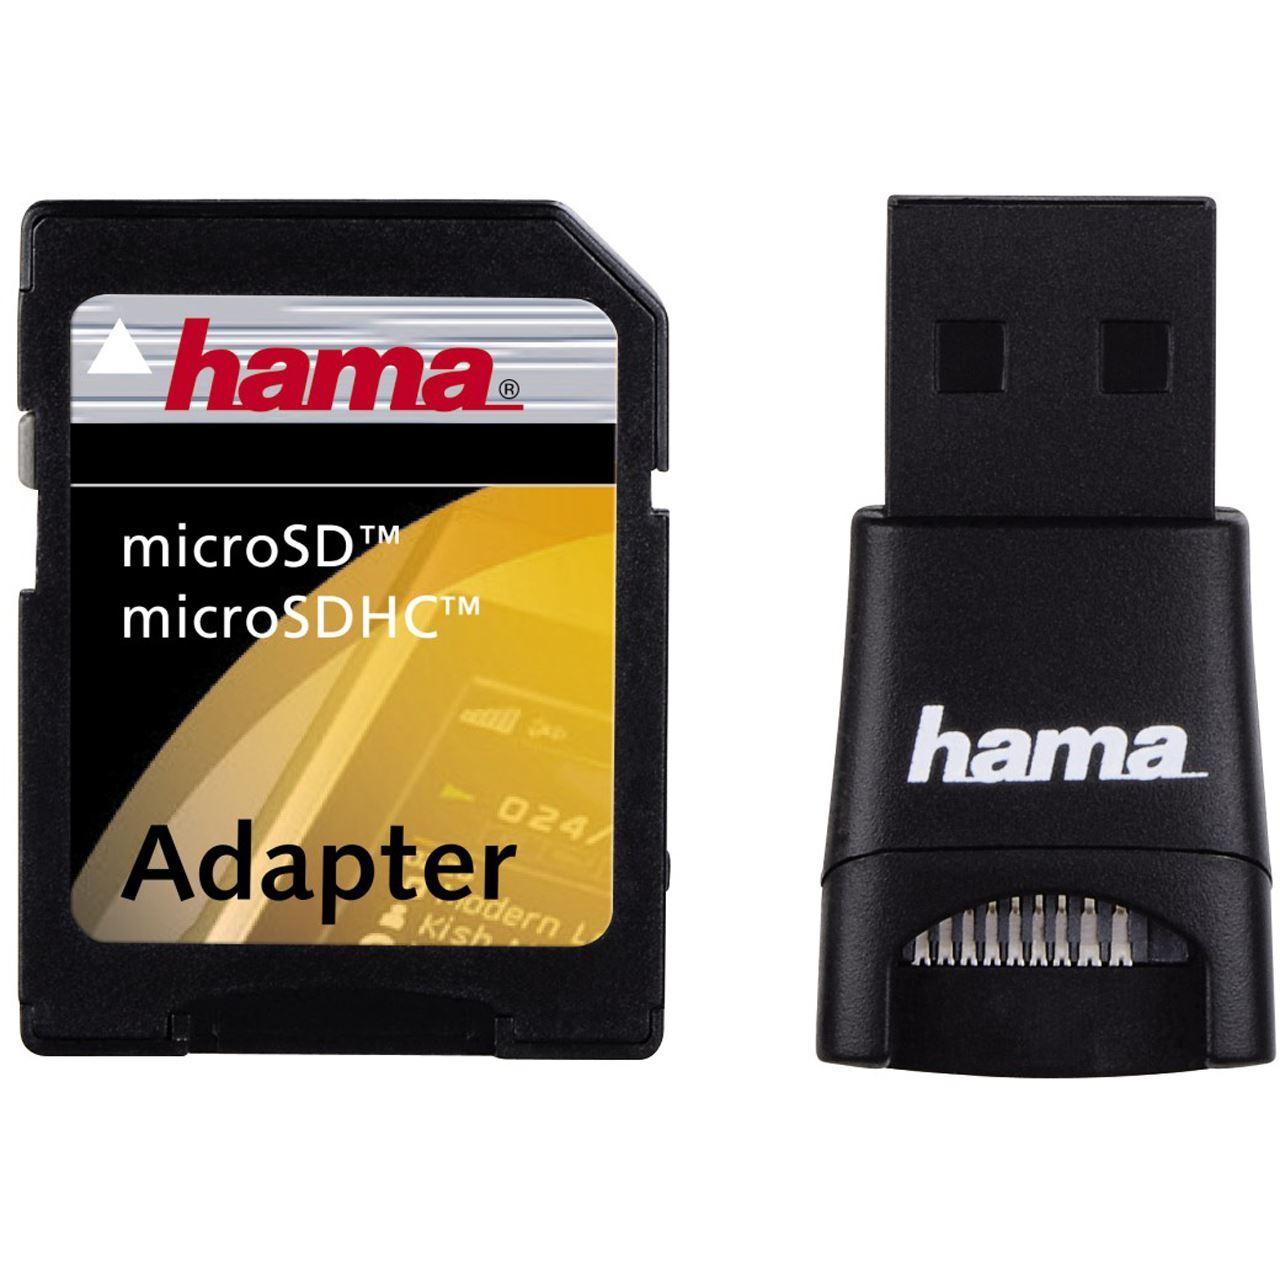 hama 00091047 usb sd adapter set usb 2 0 stick. Black Bedroom Furniture Sets. Home Design Ideas